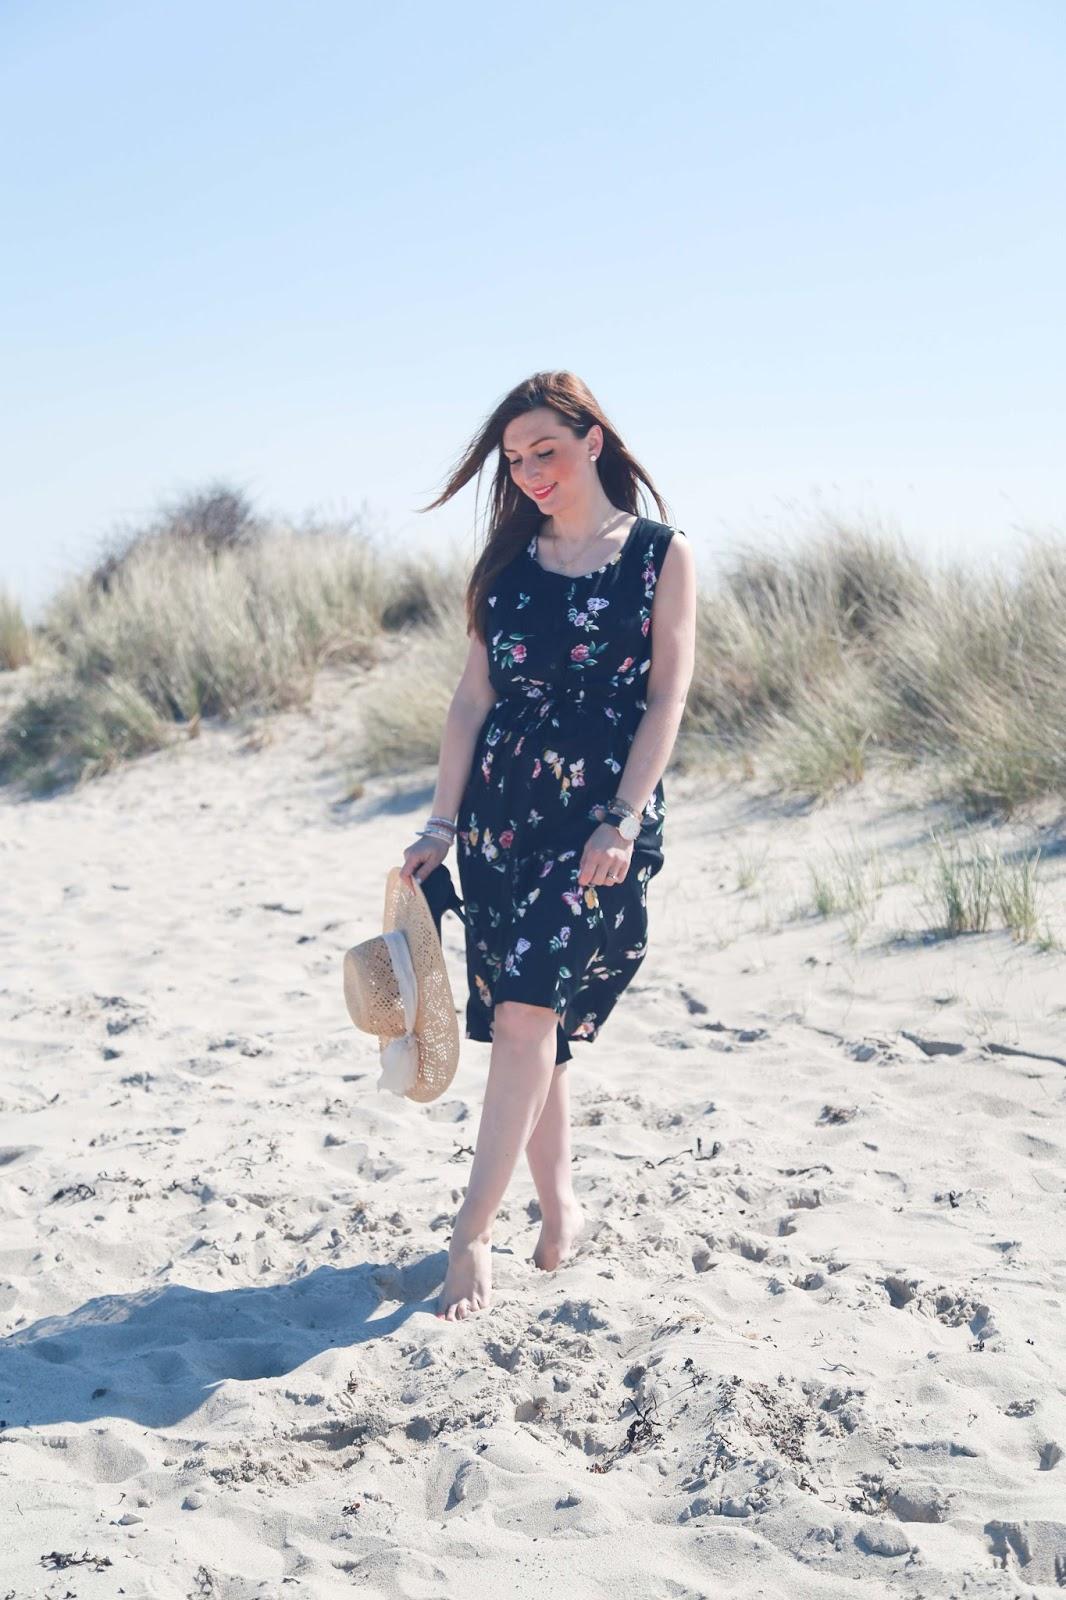 Fashionstylebyjohanna - Strohhut Blogger - Blogger Strohhut - Outfitinspiration Fashionblogger - Deutsche Fashionblogger